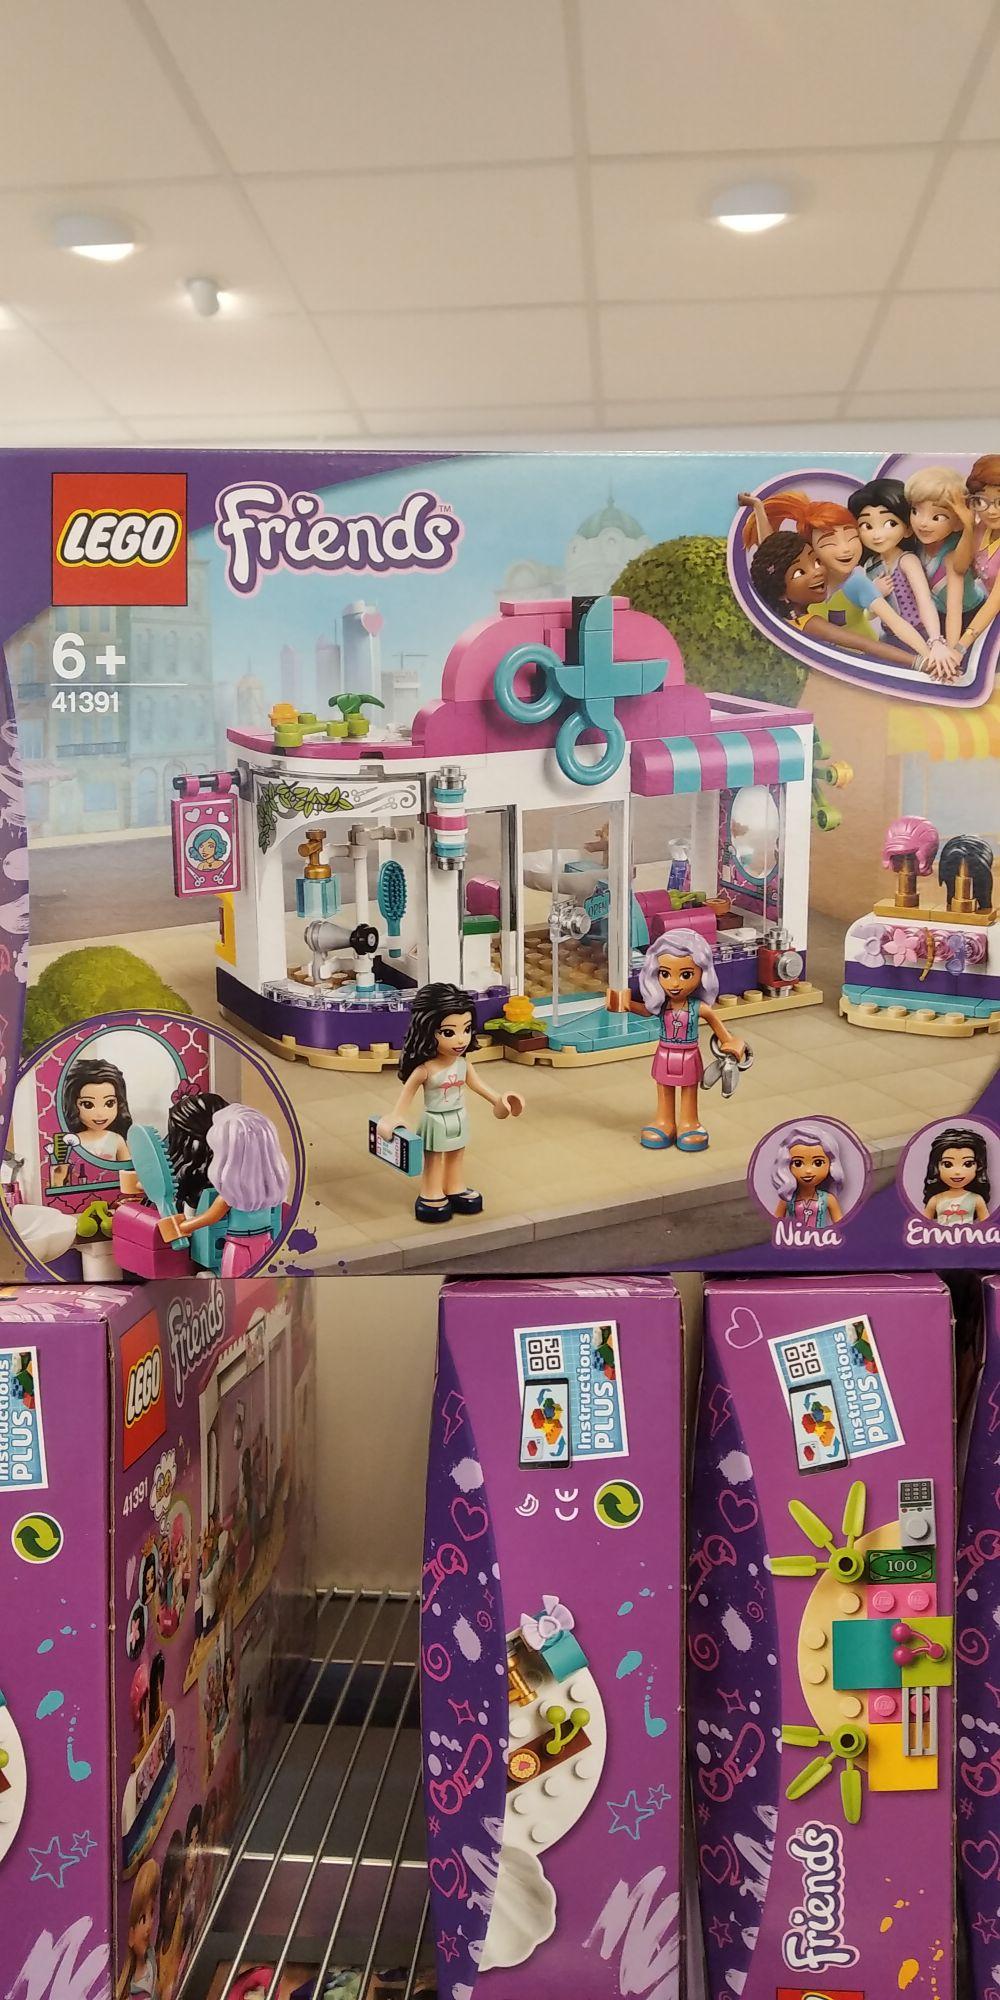 Lokal: Rossmann Lego Ninjago 71707 ++ City 60247 ++ Friends 41389 + 41391 ++ Sonderposten ab 7,99€